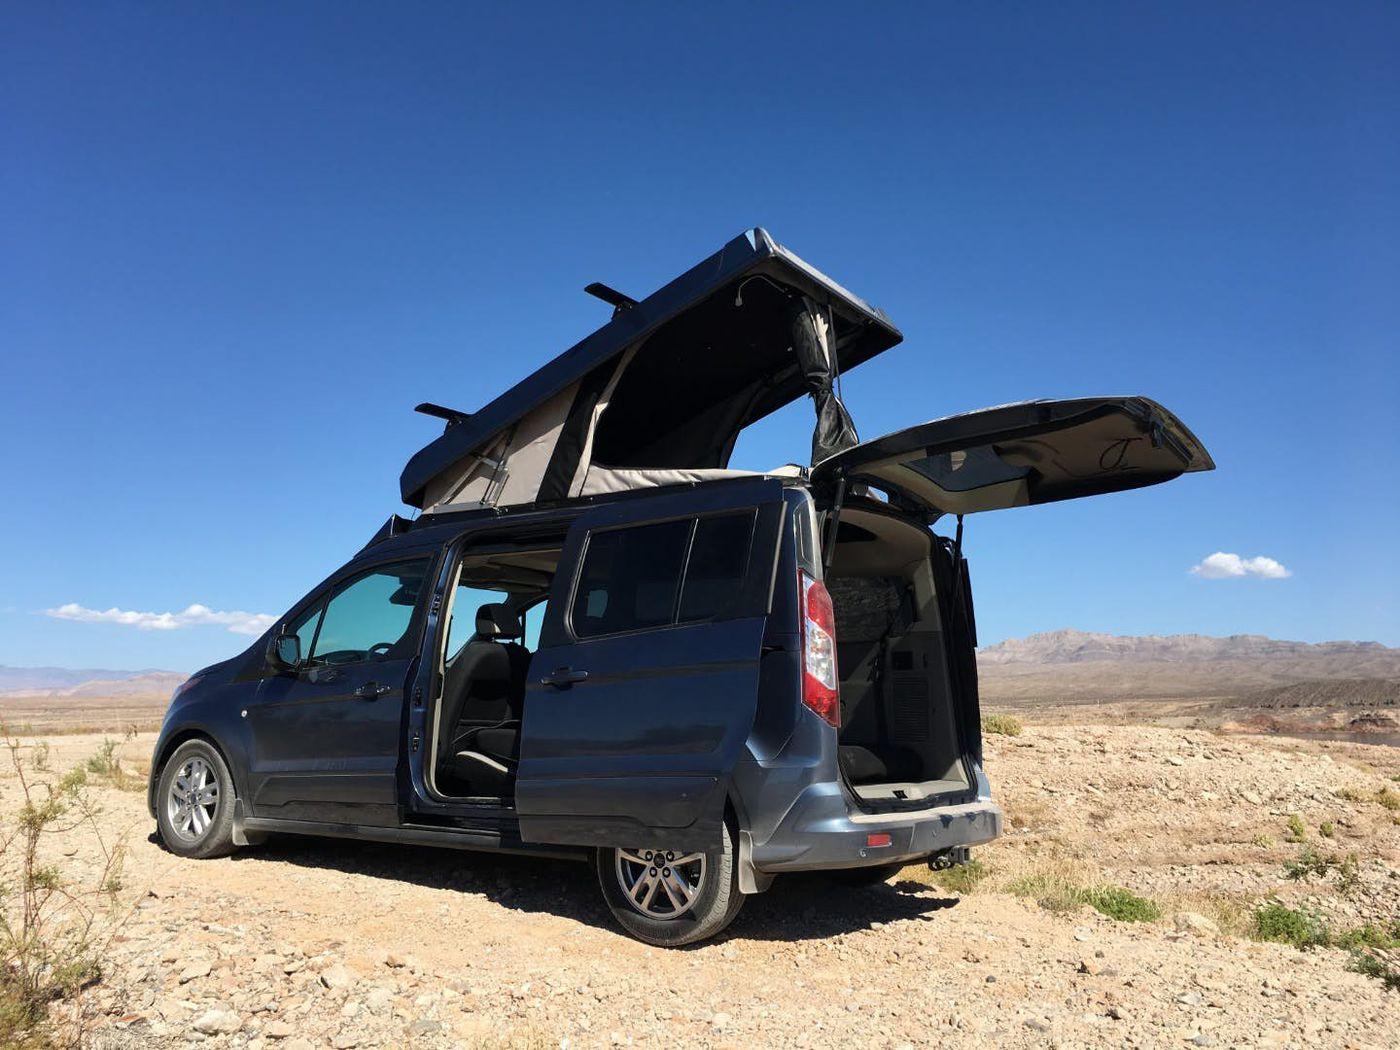 Camper van has pop-top roof for extra sleeping space - Curbed